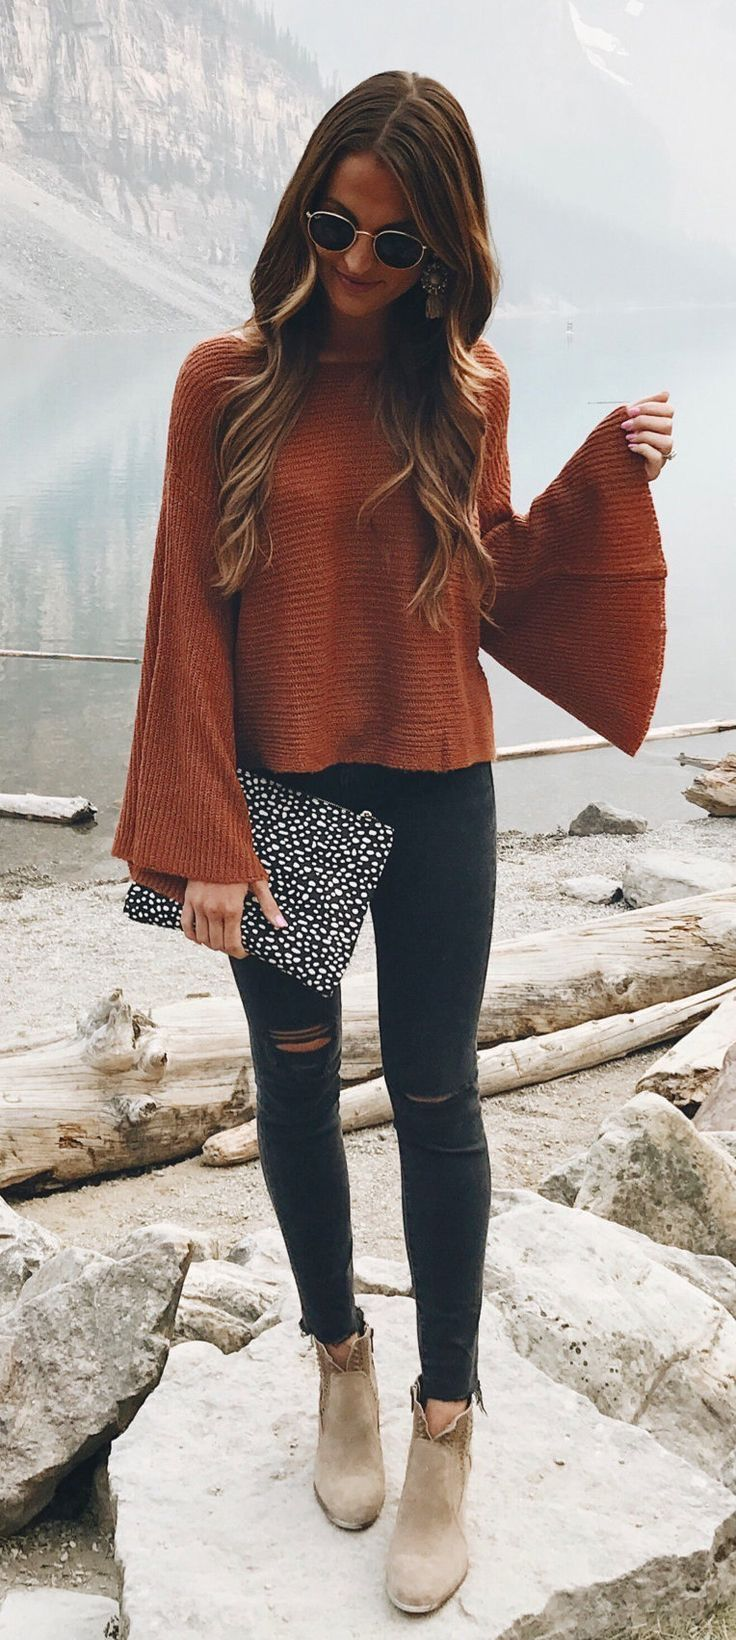 Cute burnt orange top with black jeans.